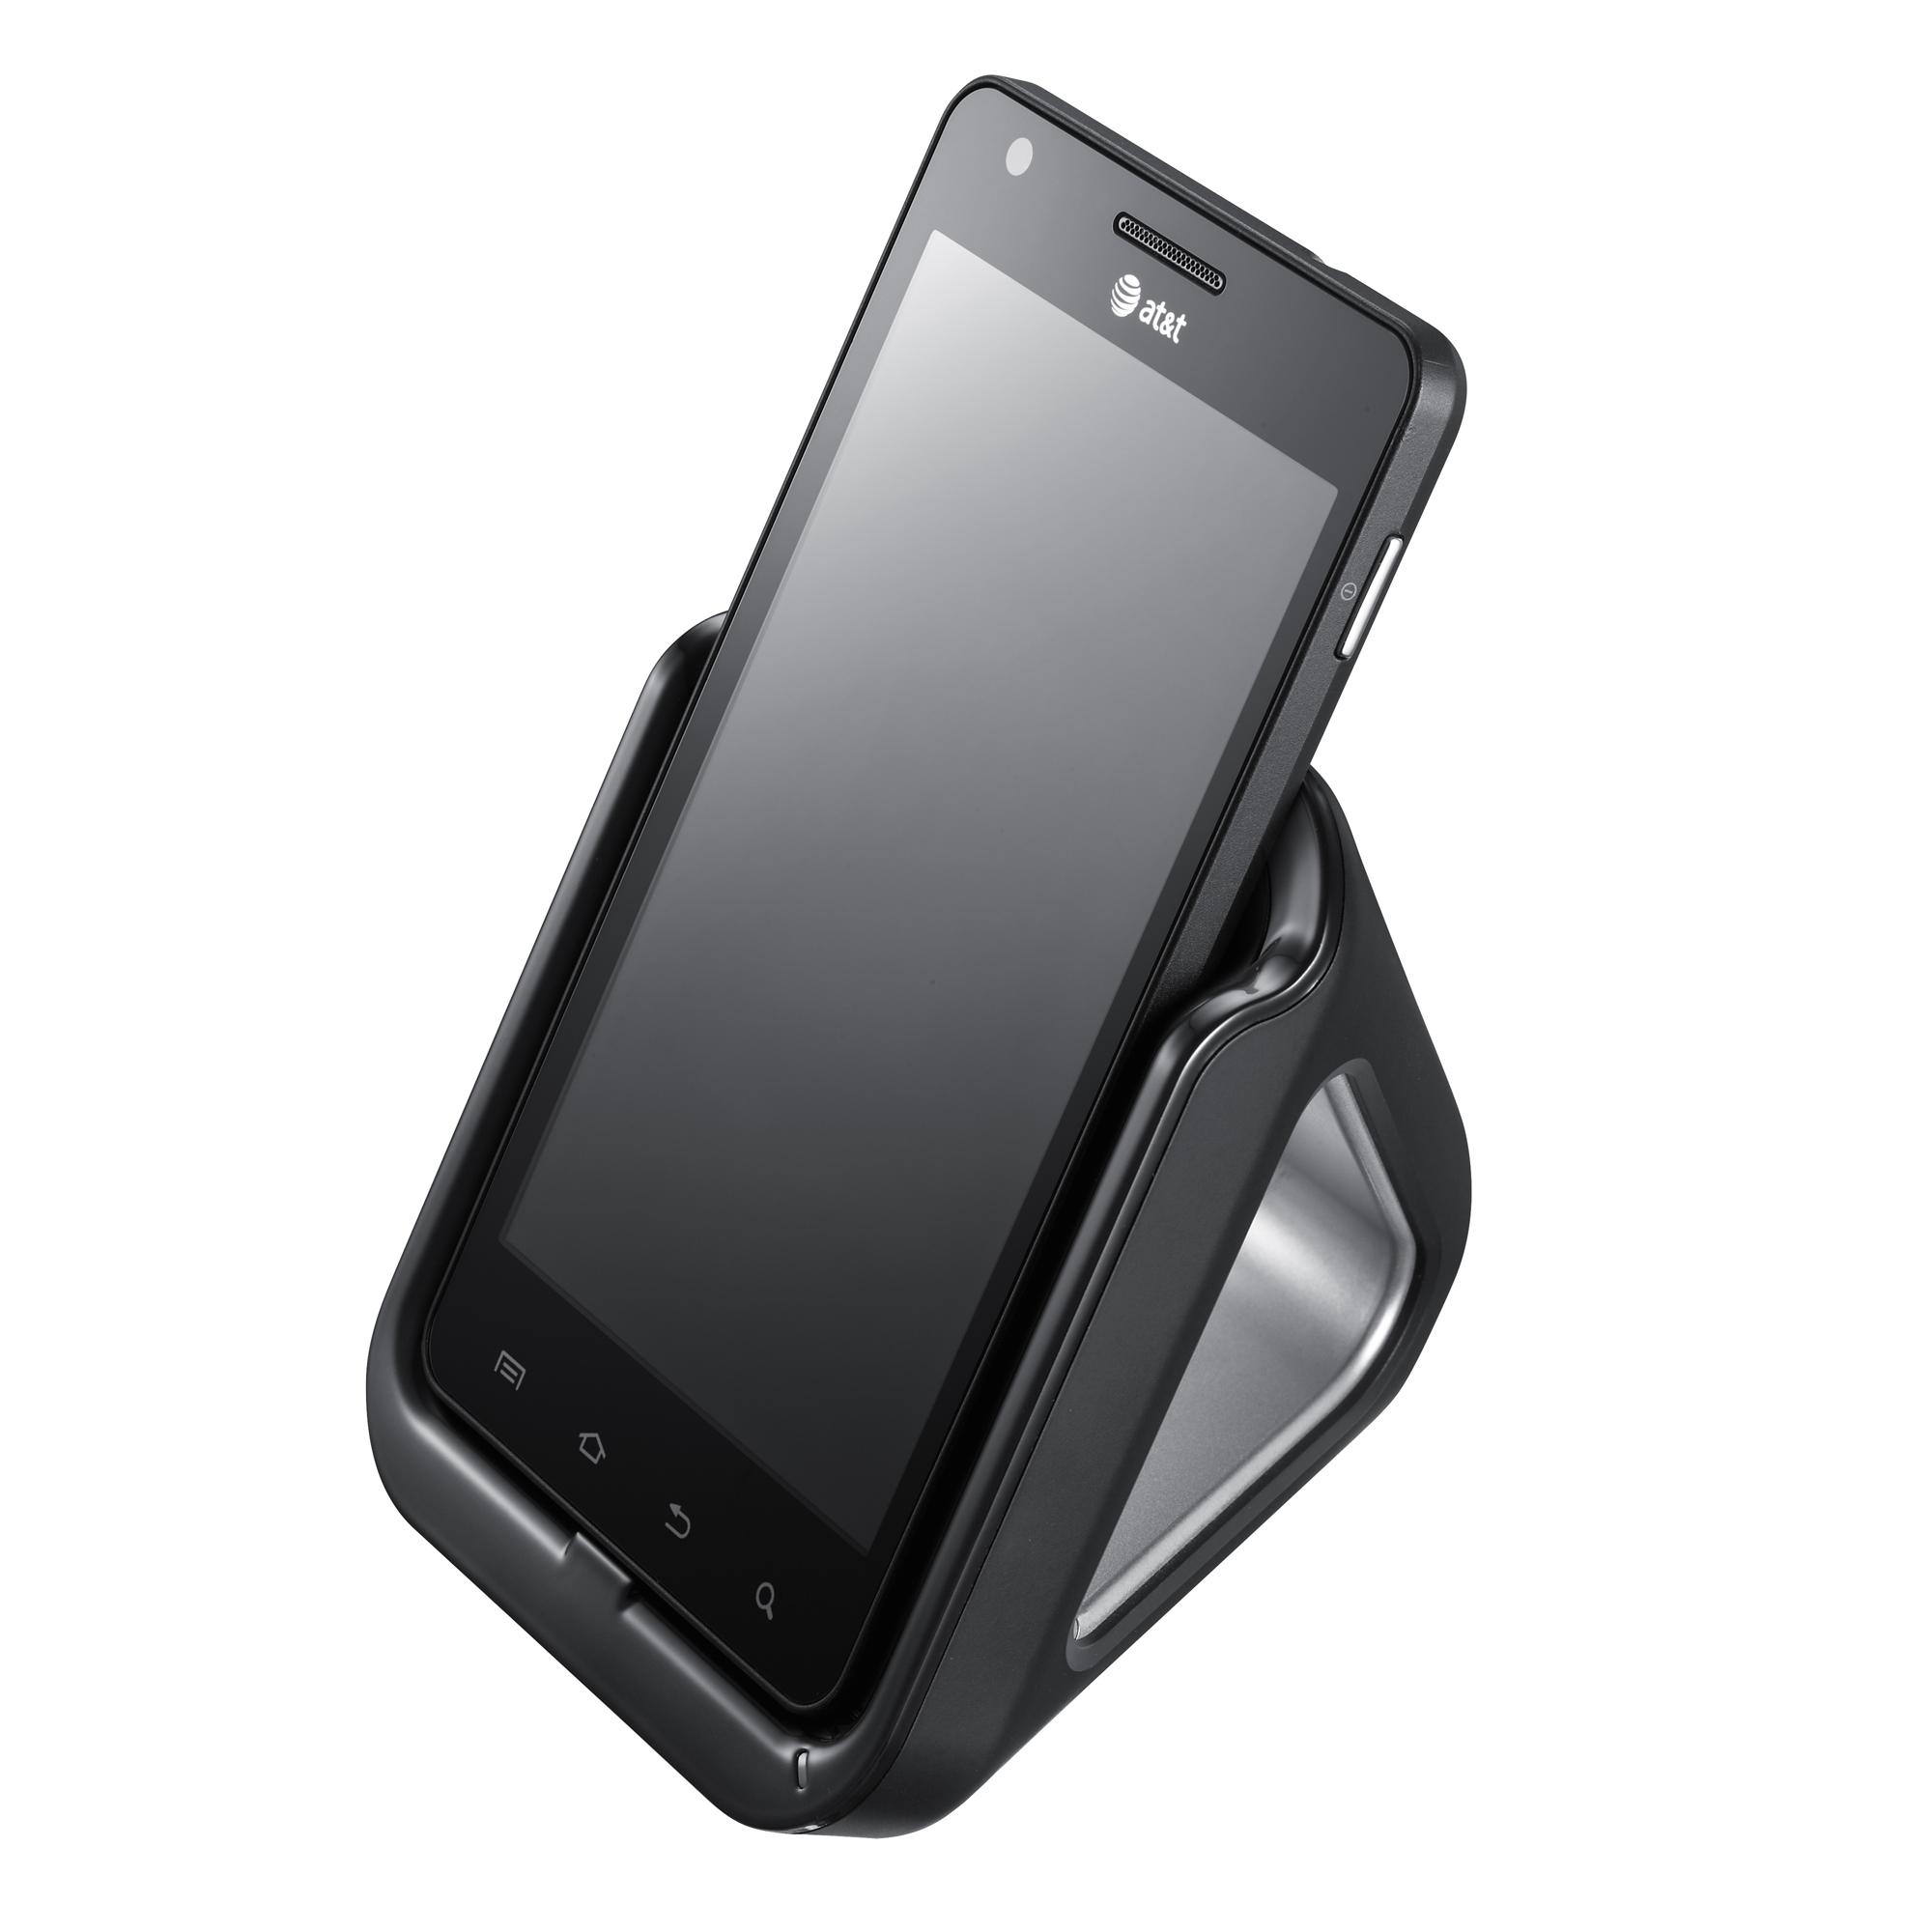 Station Samsung Galaxy S 2